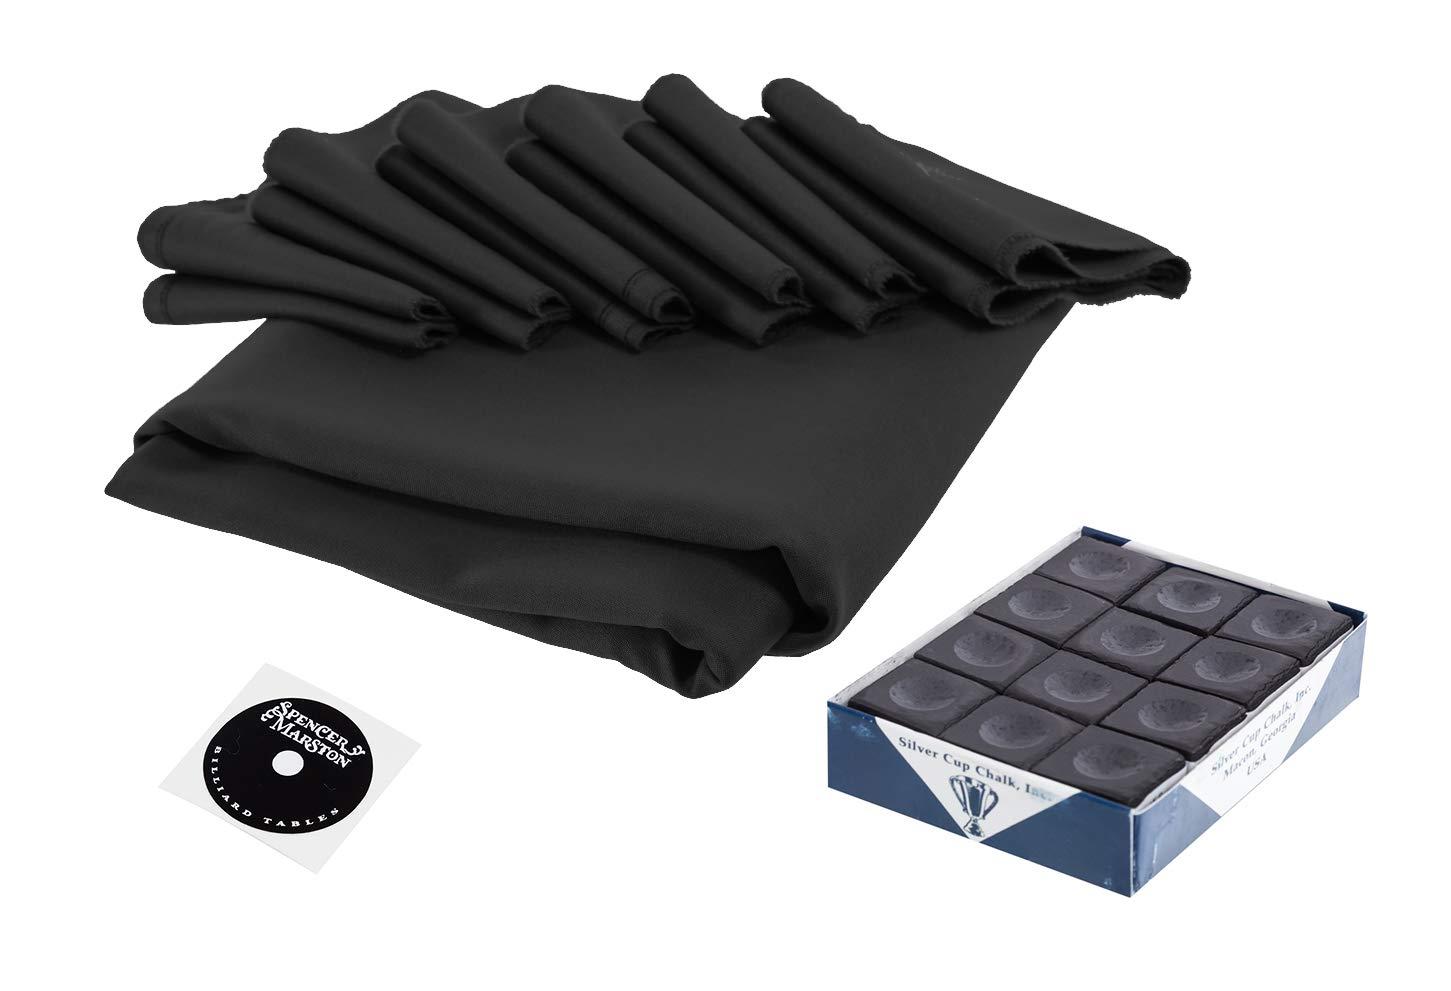 Spencer Marston 8 ft Billiards Table Simonis 860 Cloth Set